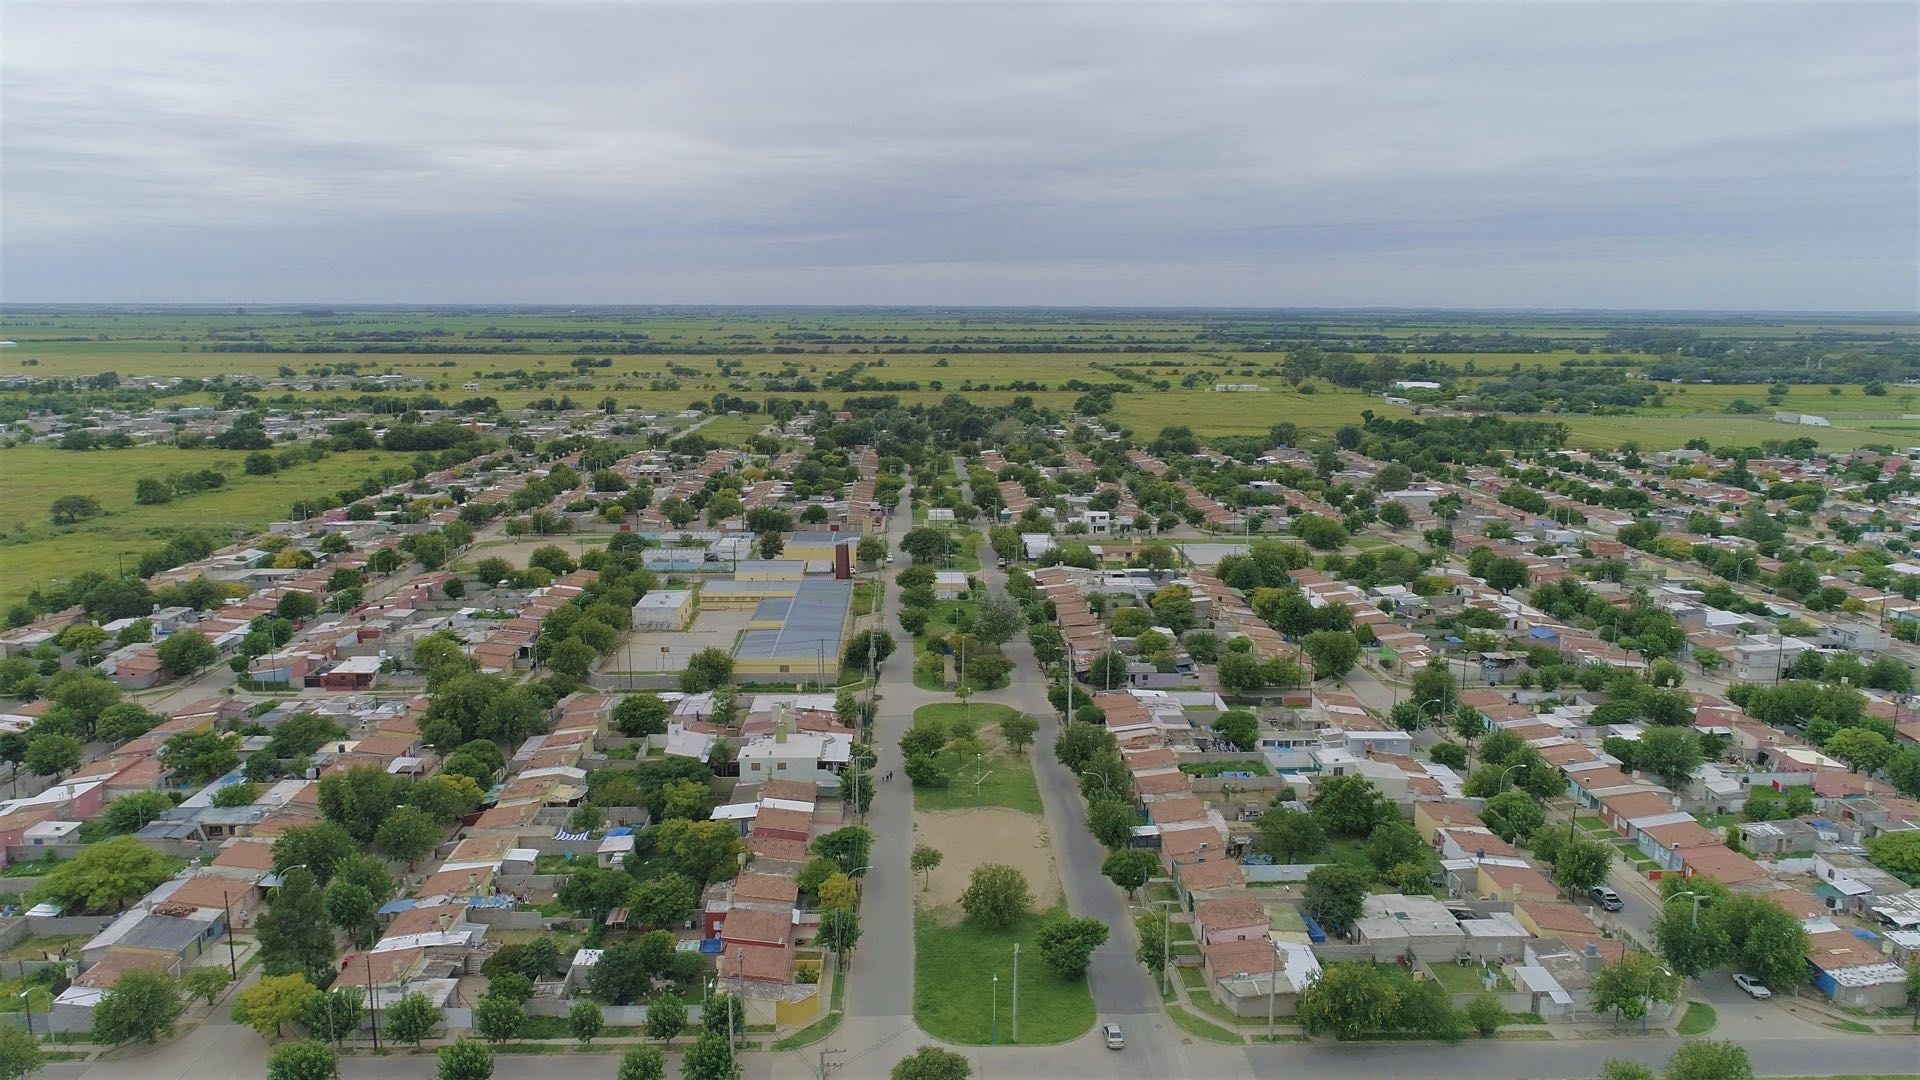 Plan Barrios Ciudades – 1267 Viviendas